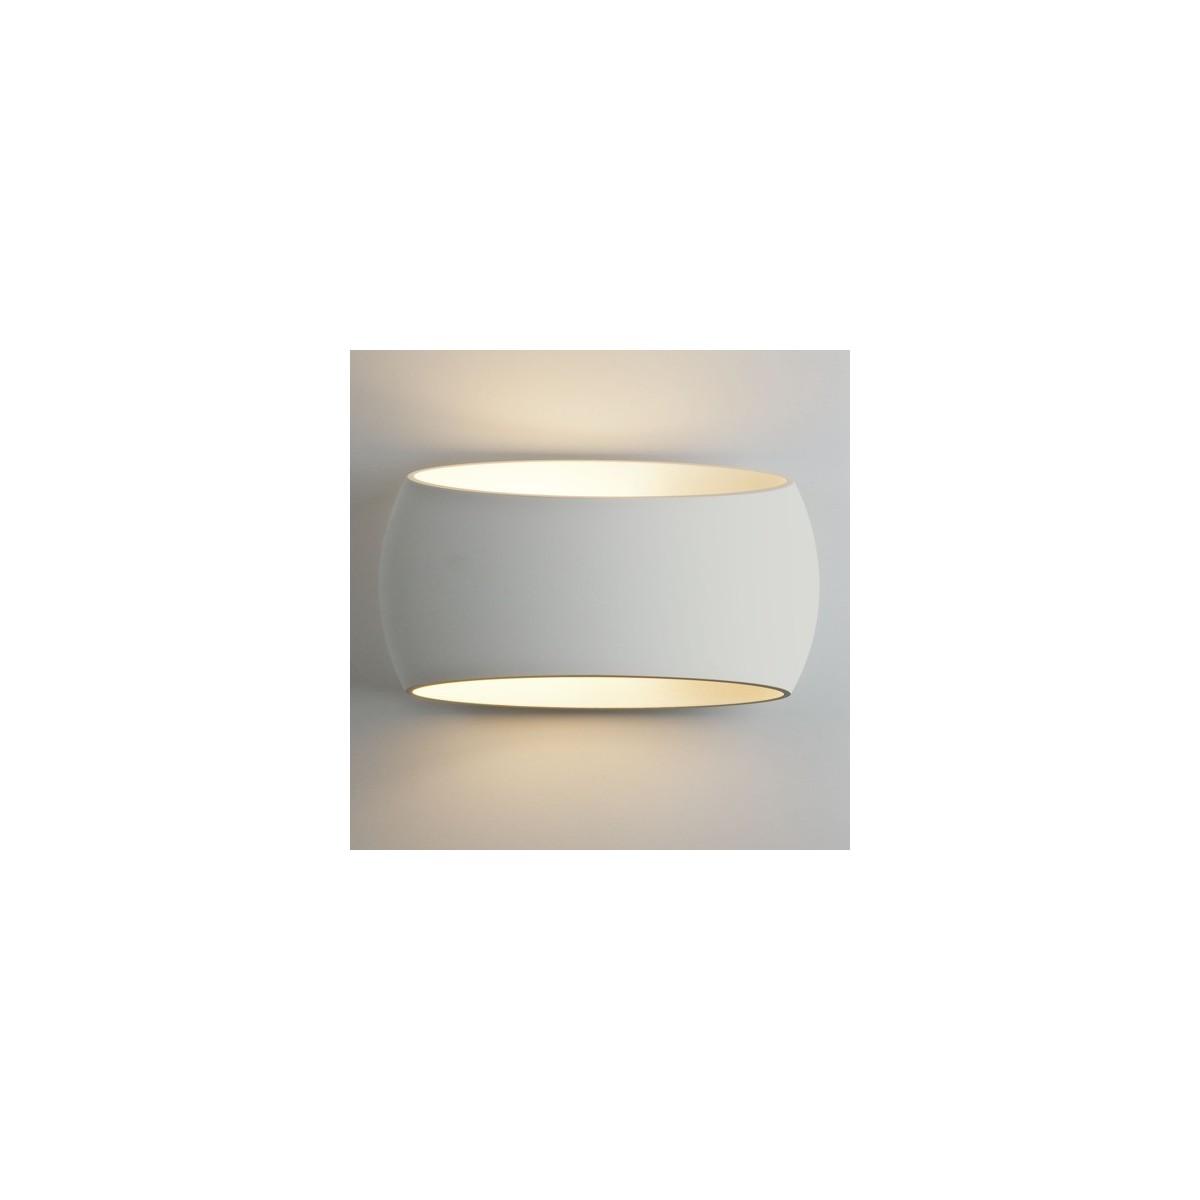 Astro Aria 300 Ścienna 1x12W Max LED E27 Gips 1300001